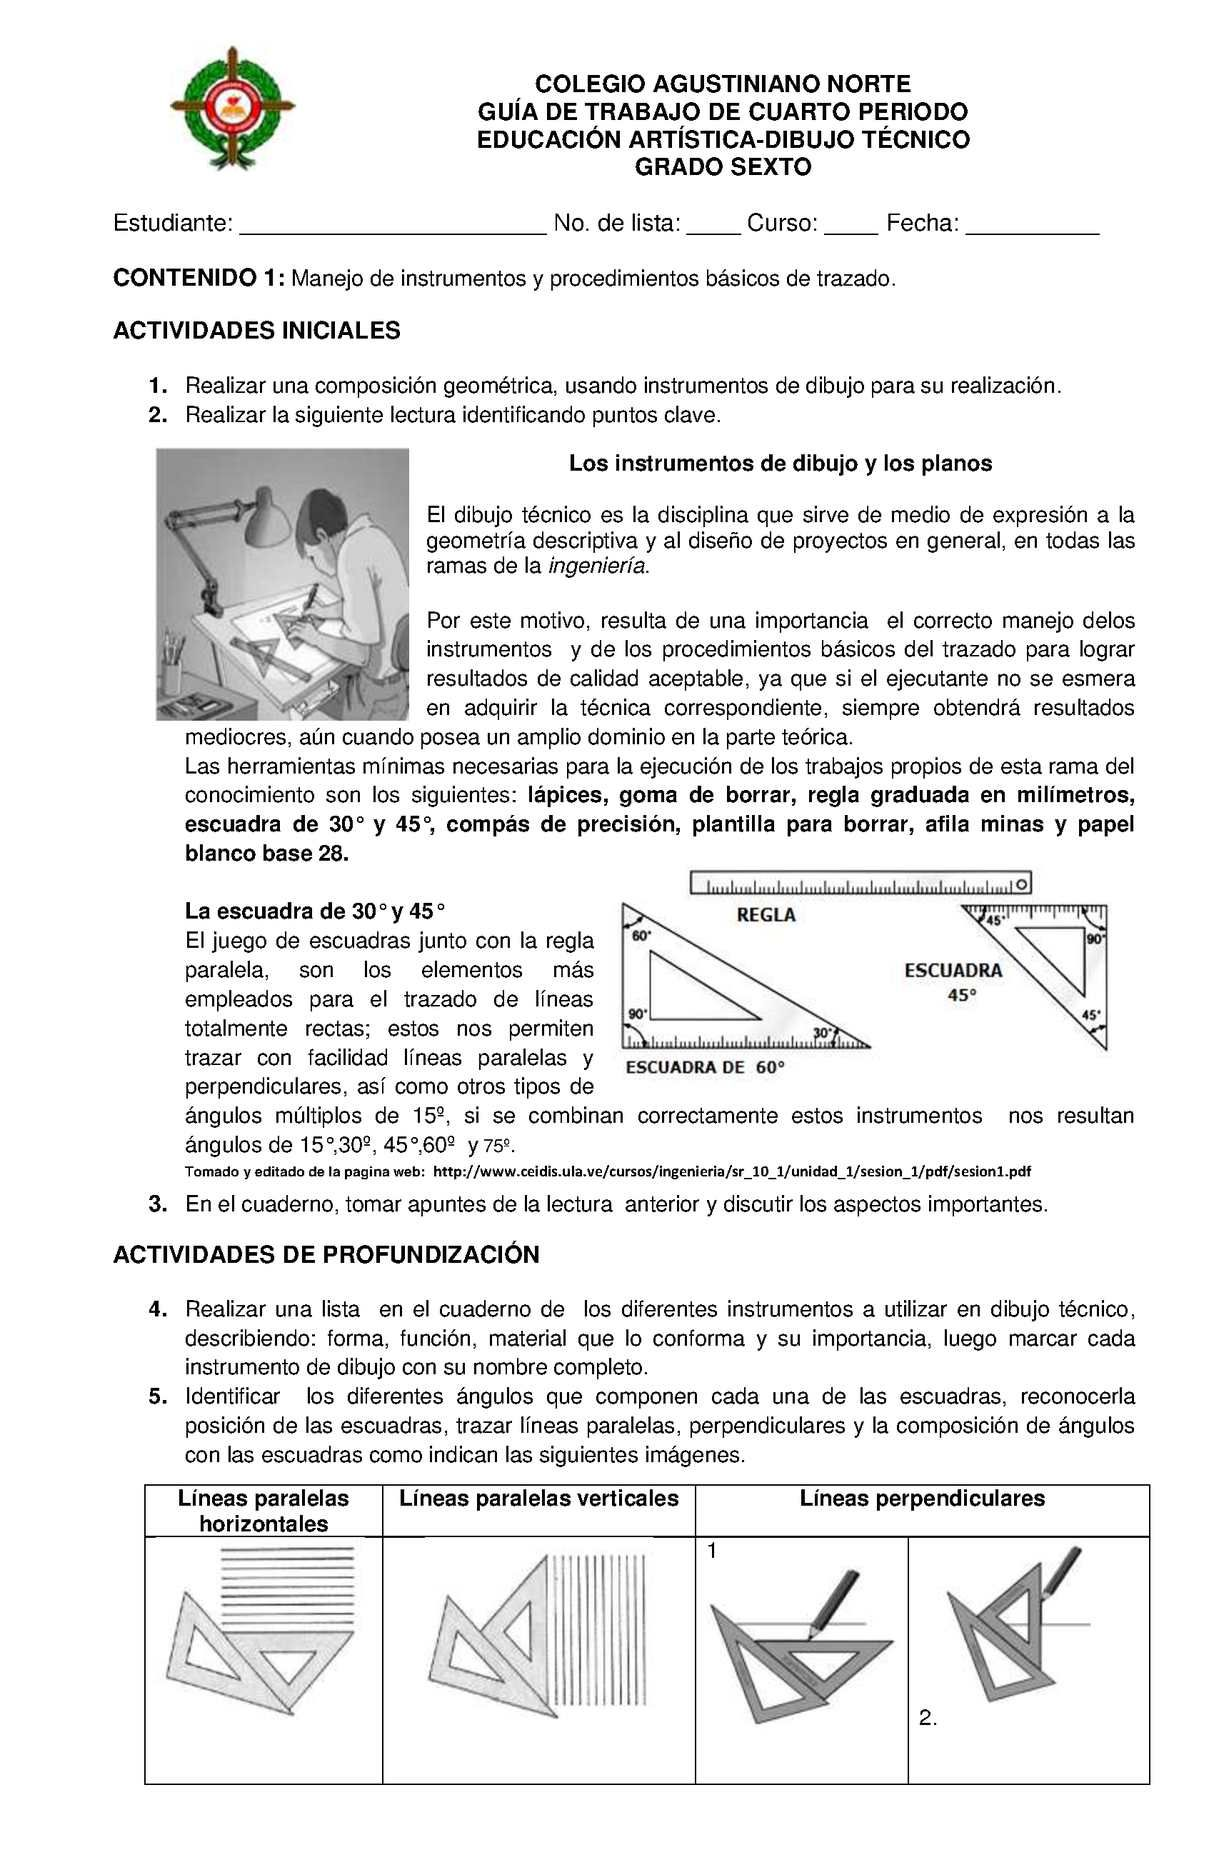 Guia De Trabajo Dibujo Tecnico Sexto Tecnicas De Dibujo Instrumentos De Dibujo Educacion Artistica